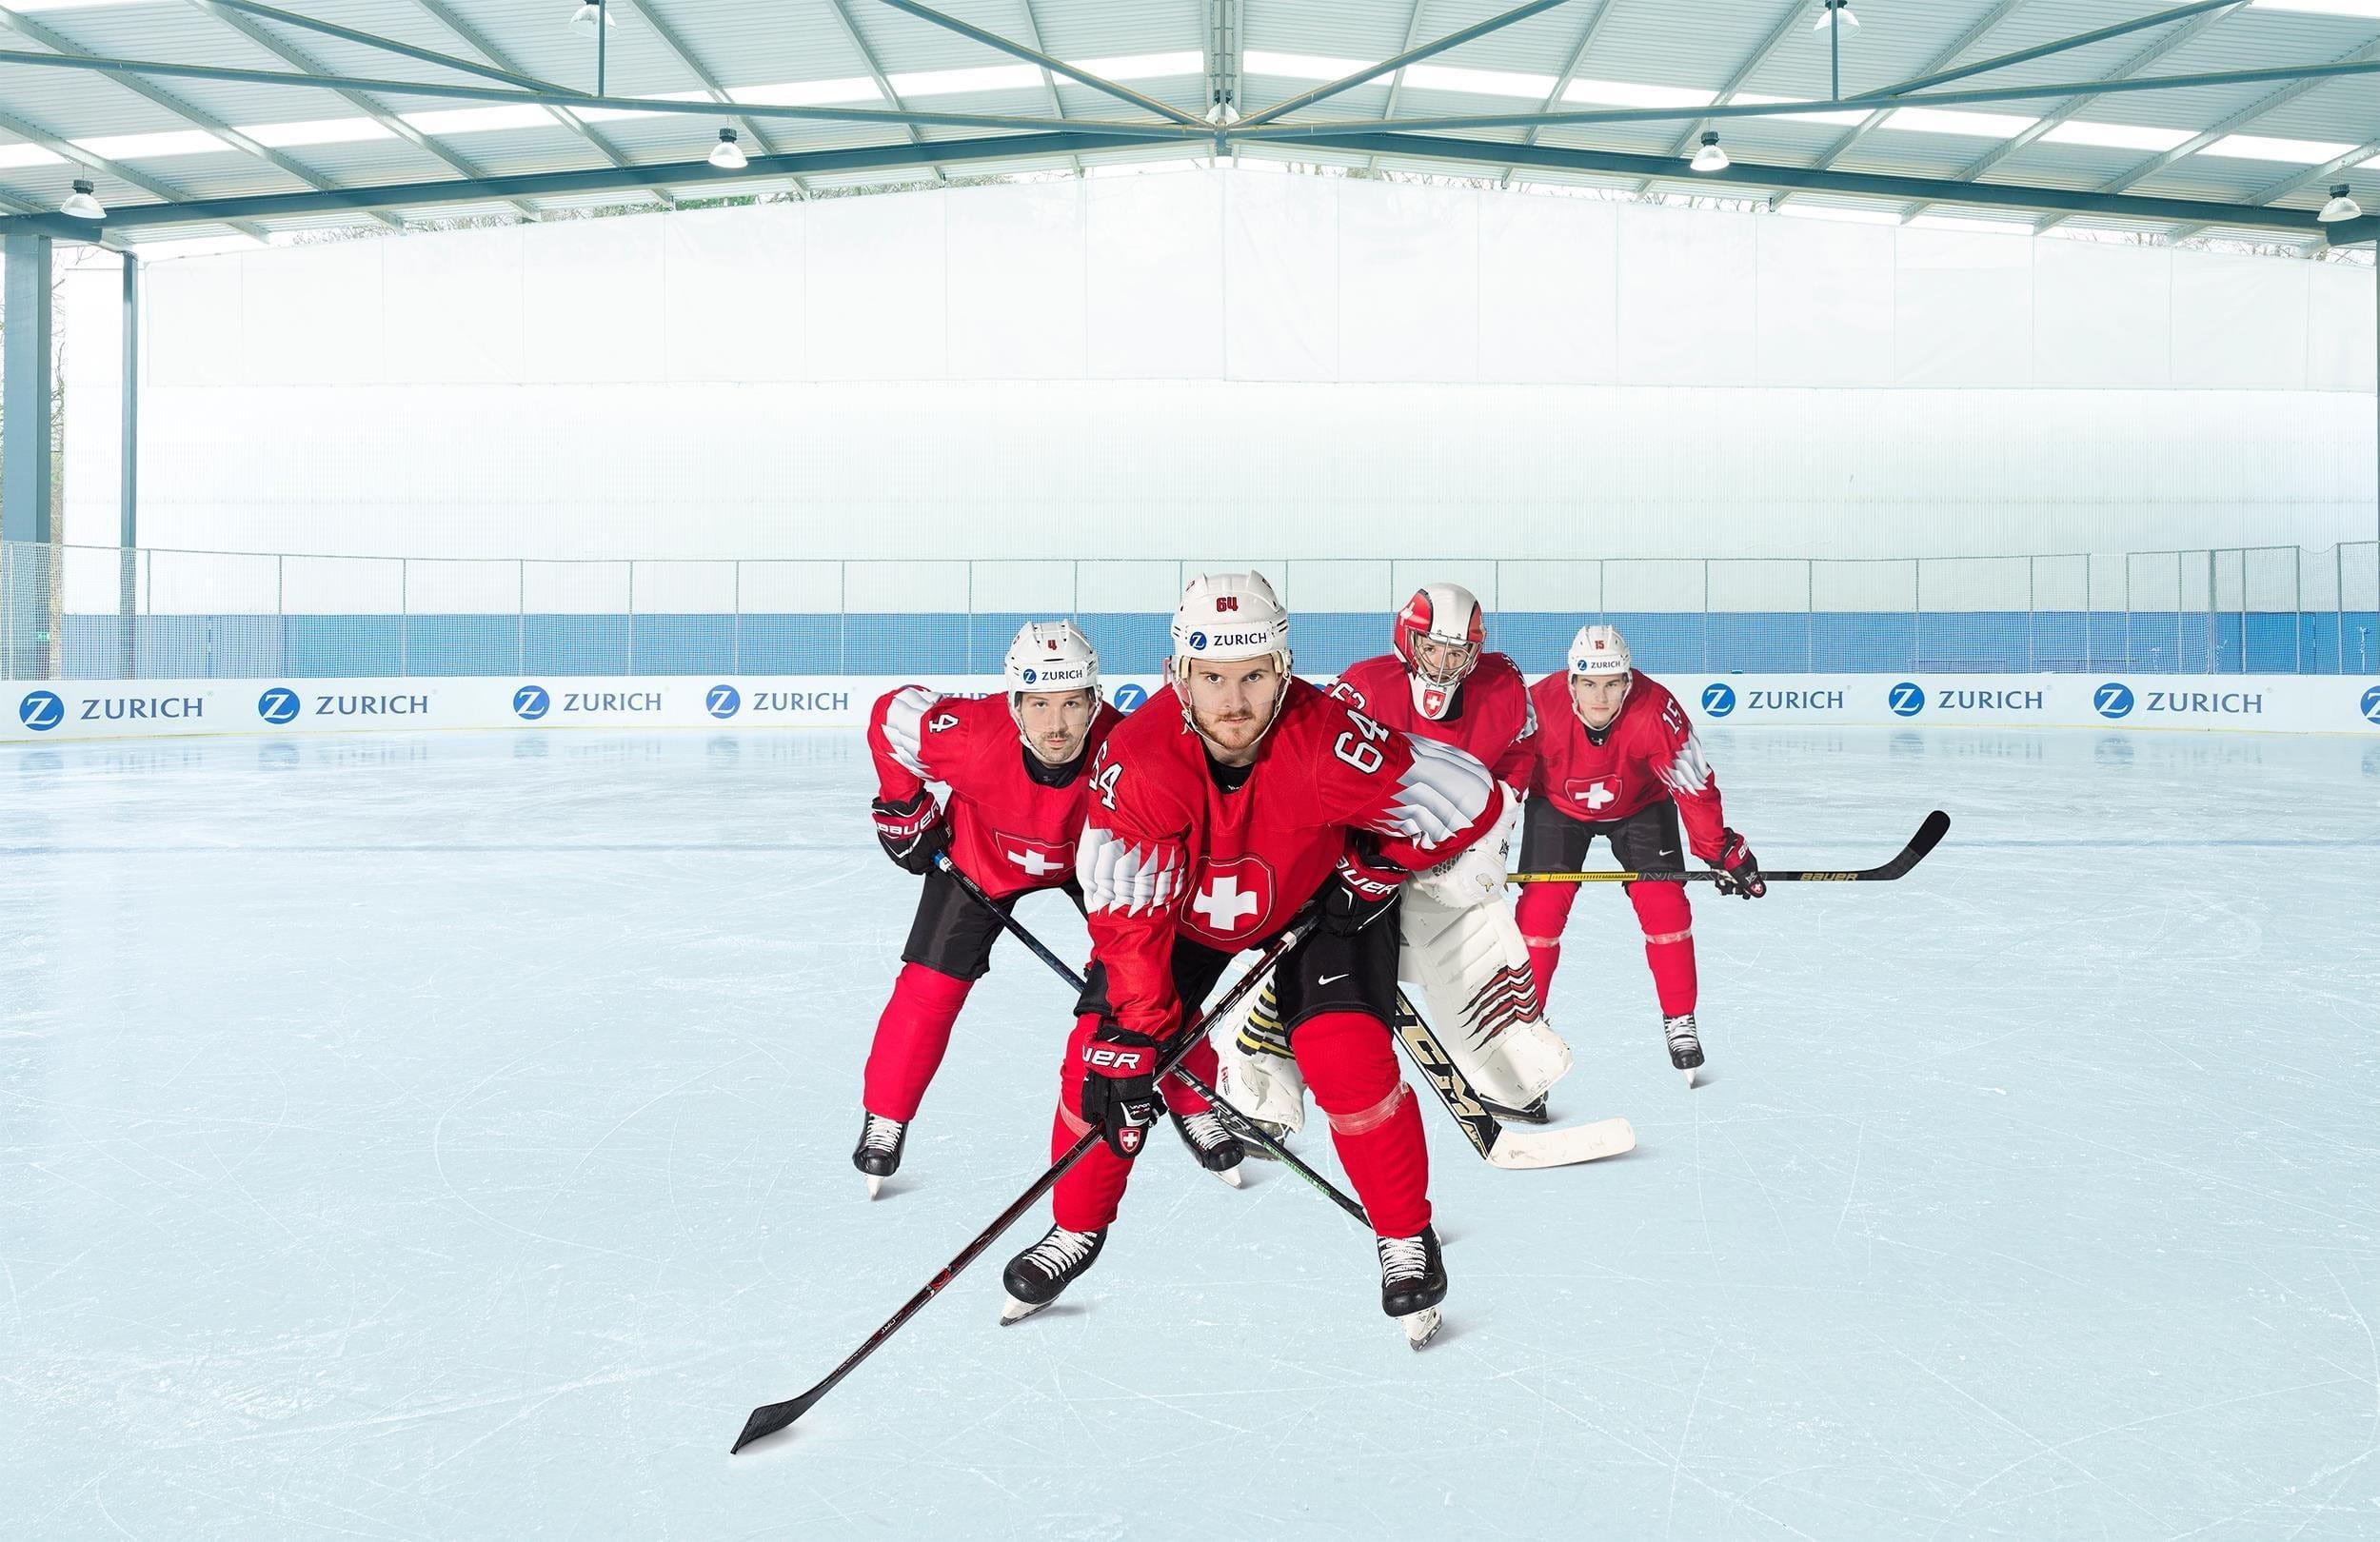 Swiss national ice hockey team